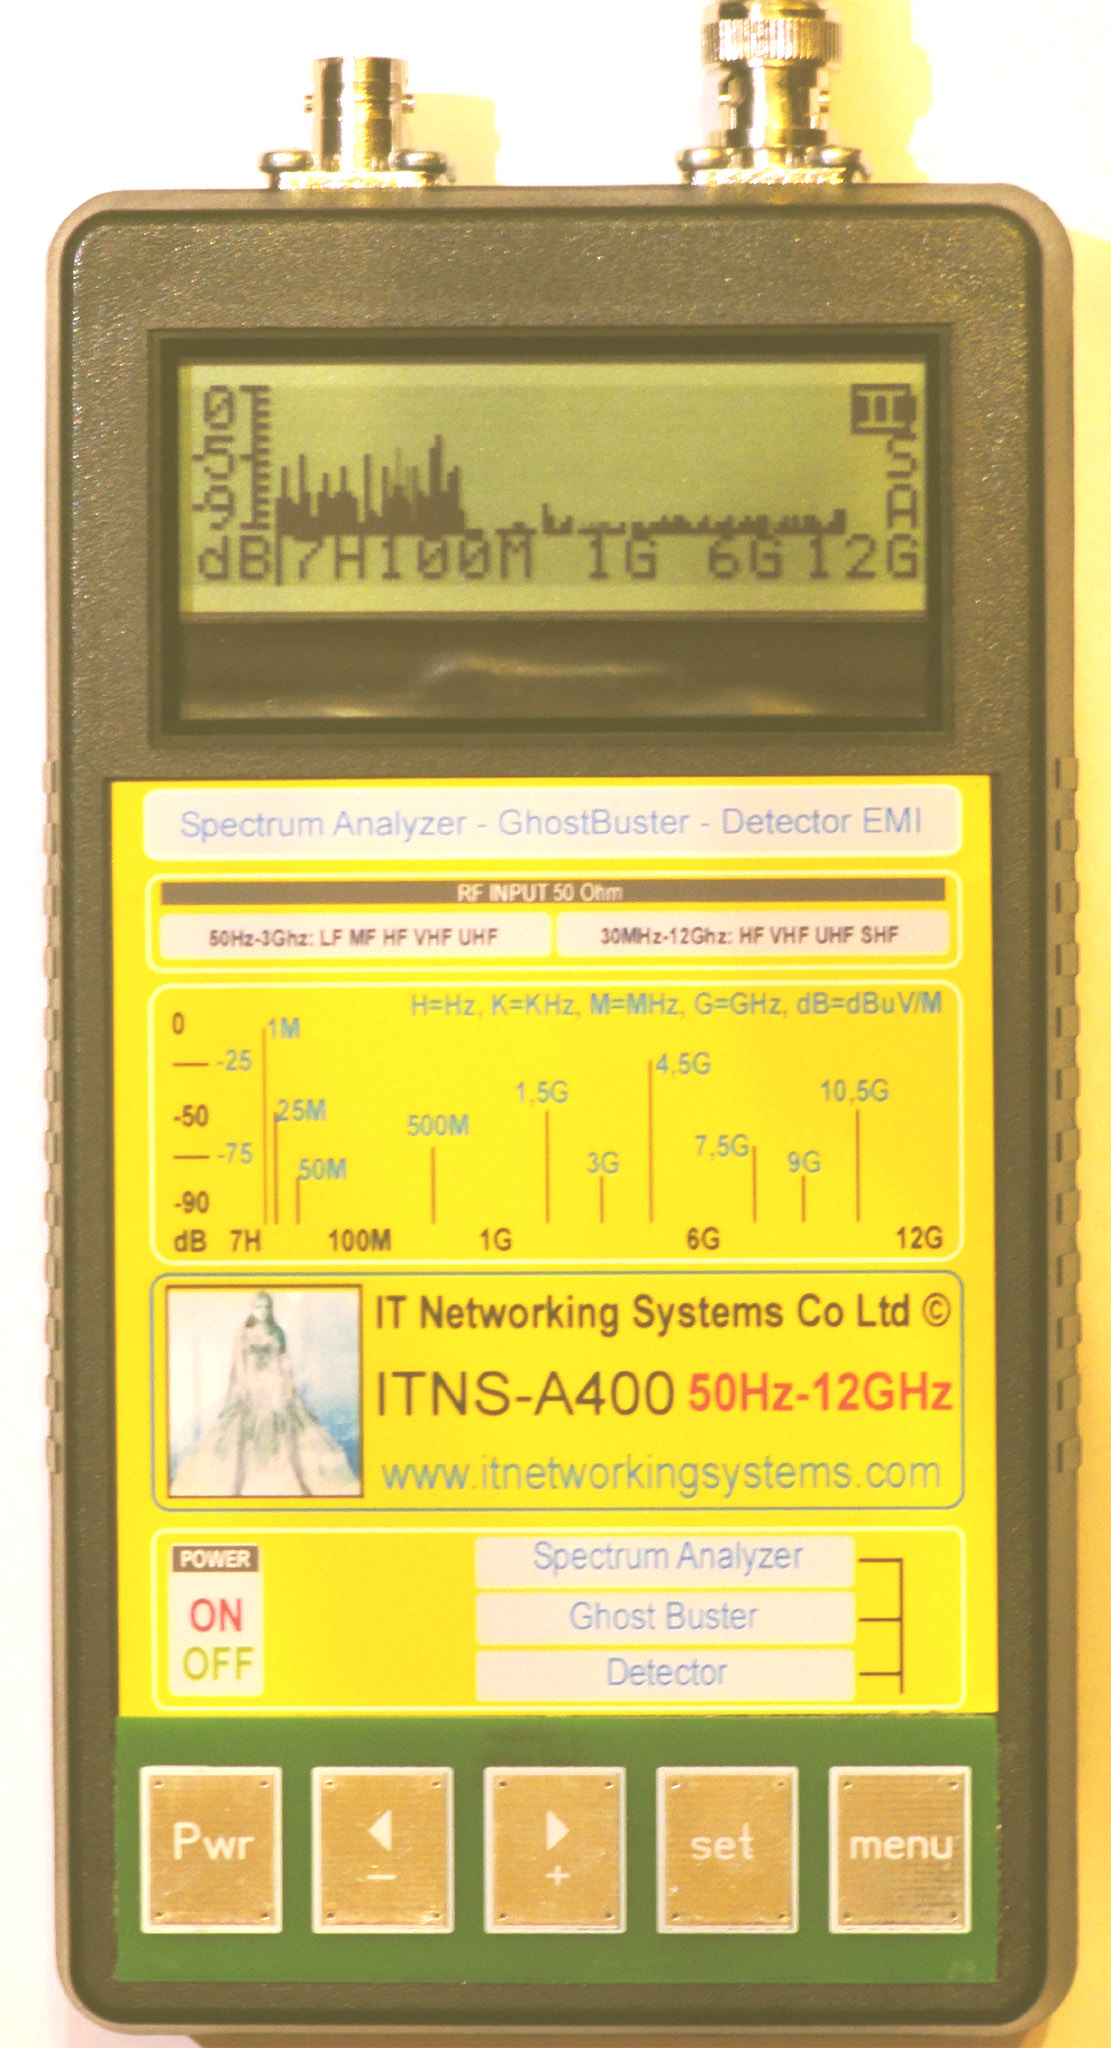 ITNS-A400 анализатор спектра